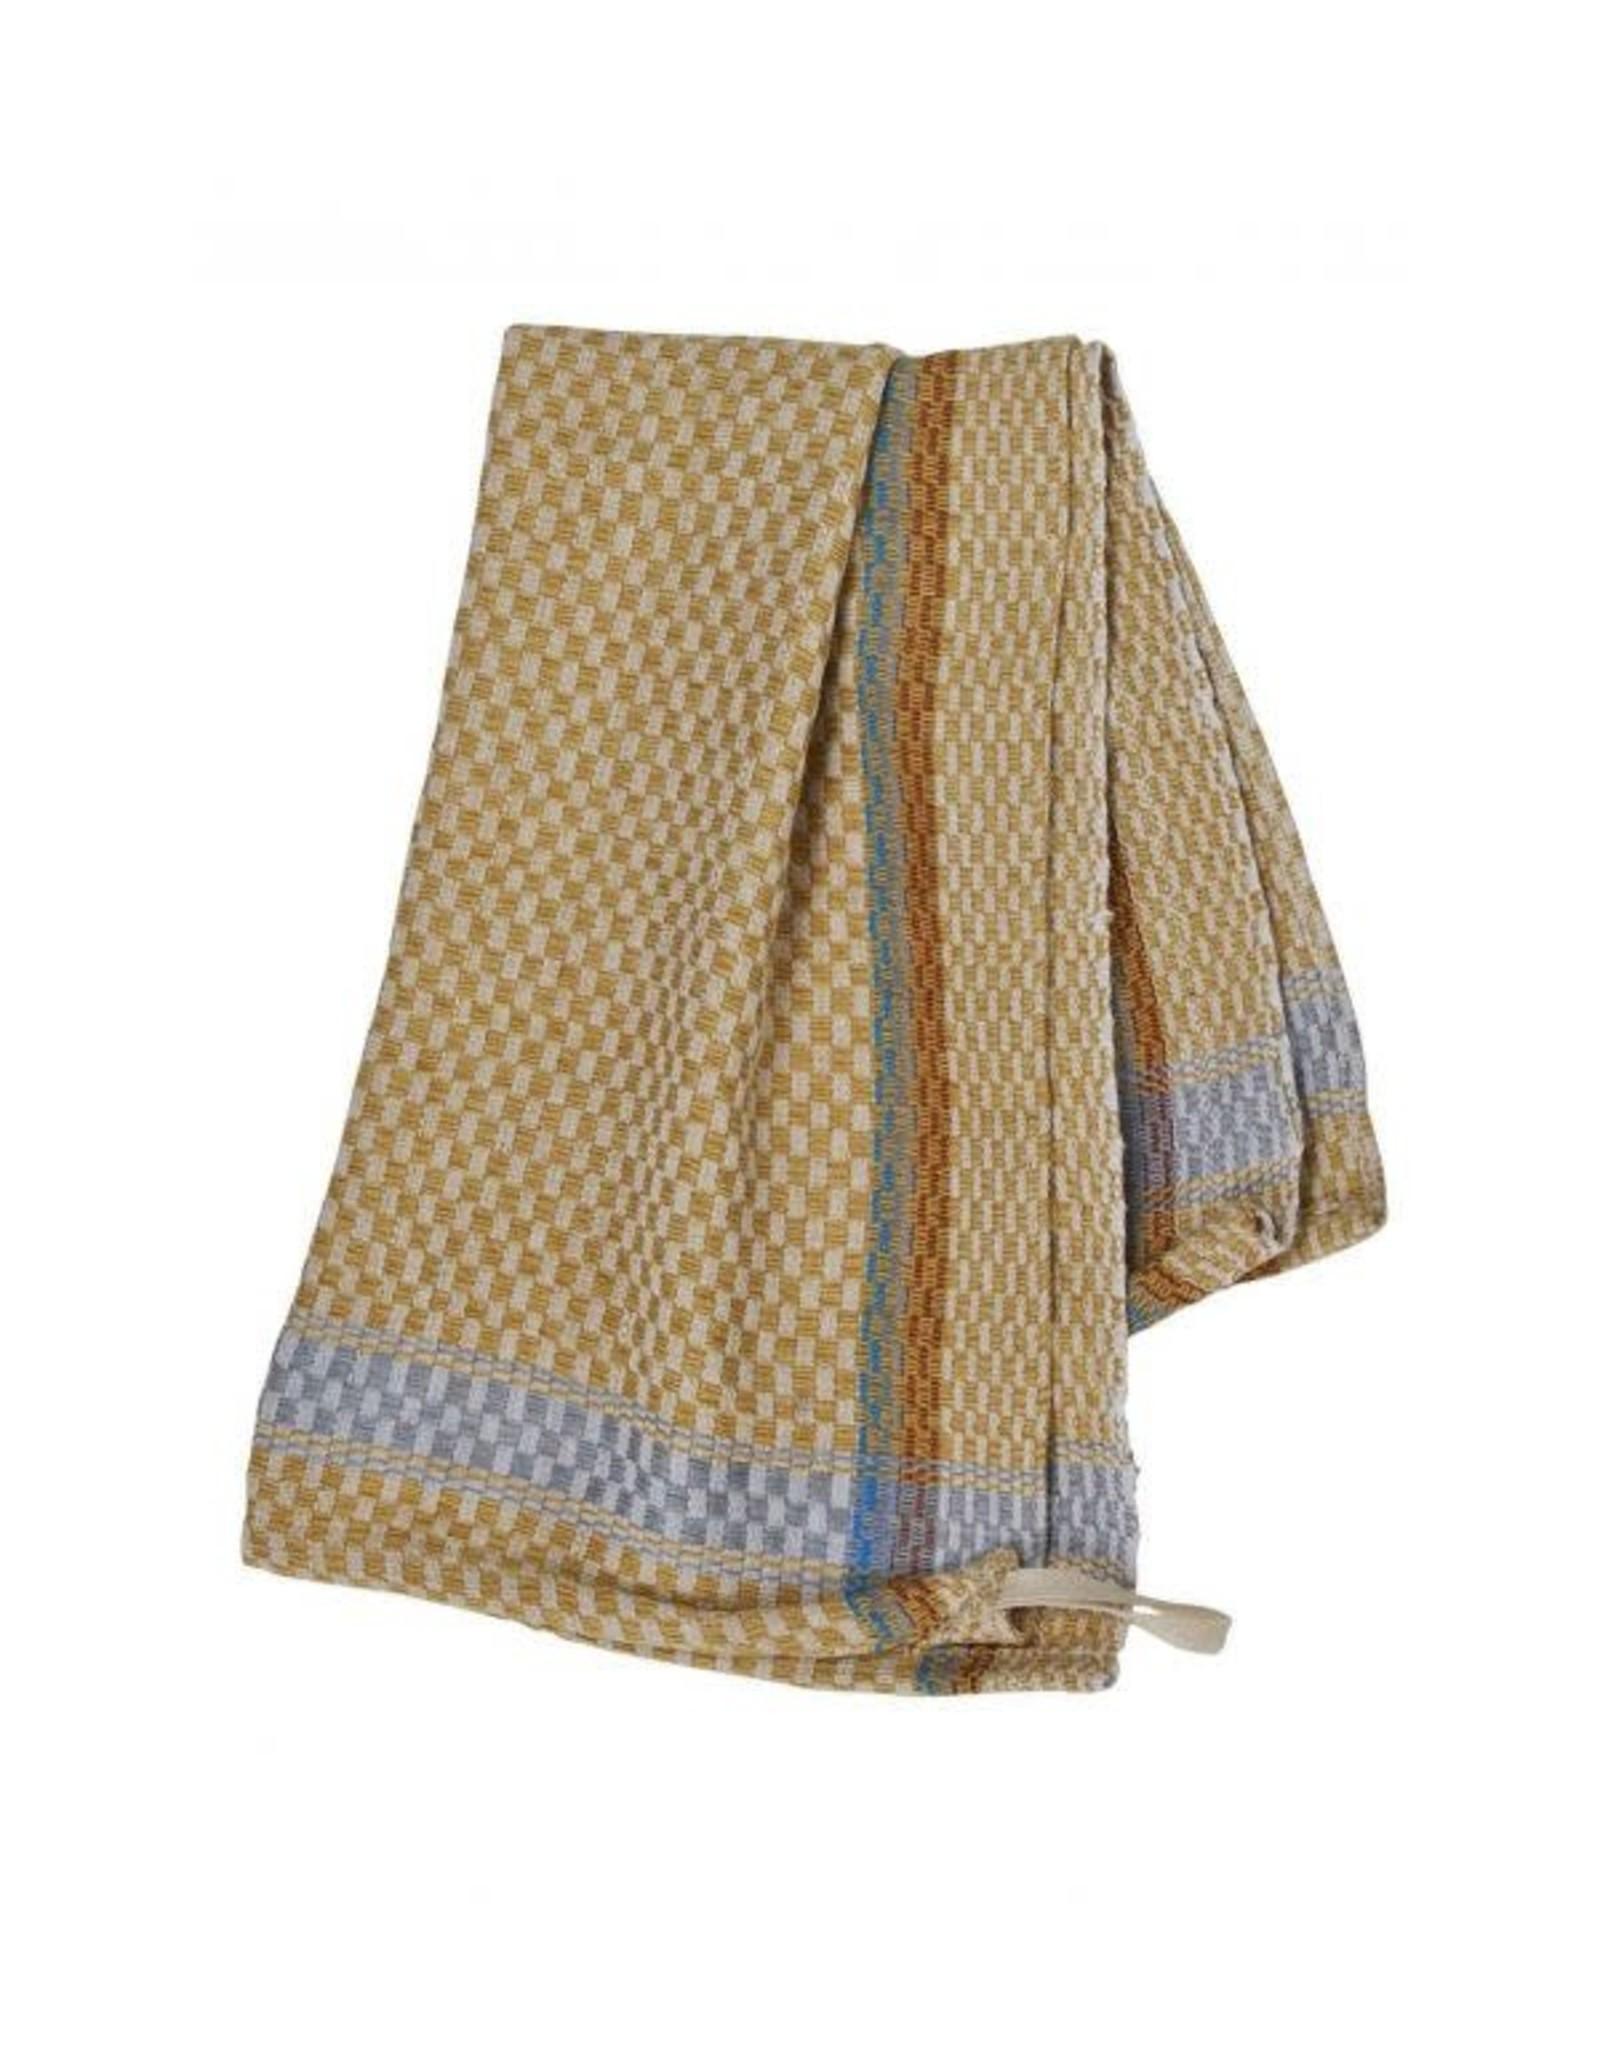 Checked Tea Towel, Yellow/Gold, Egypt